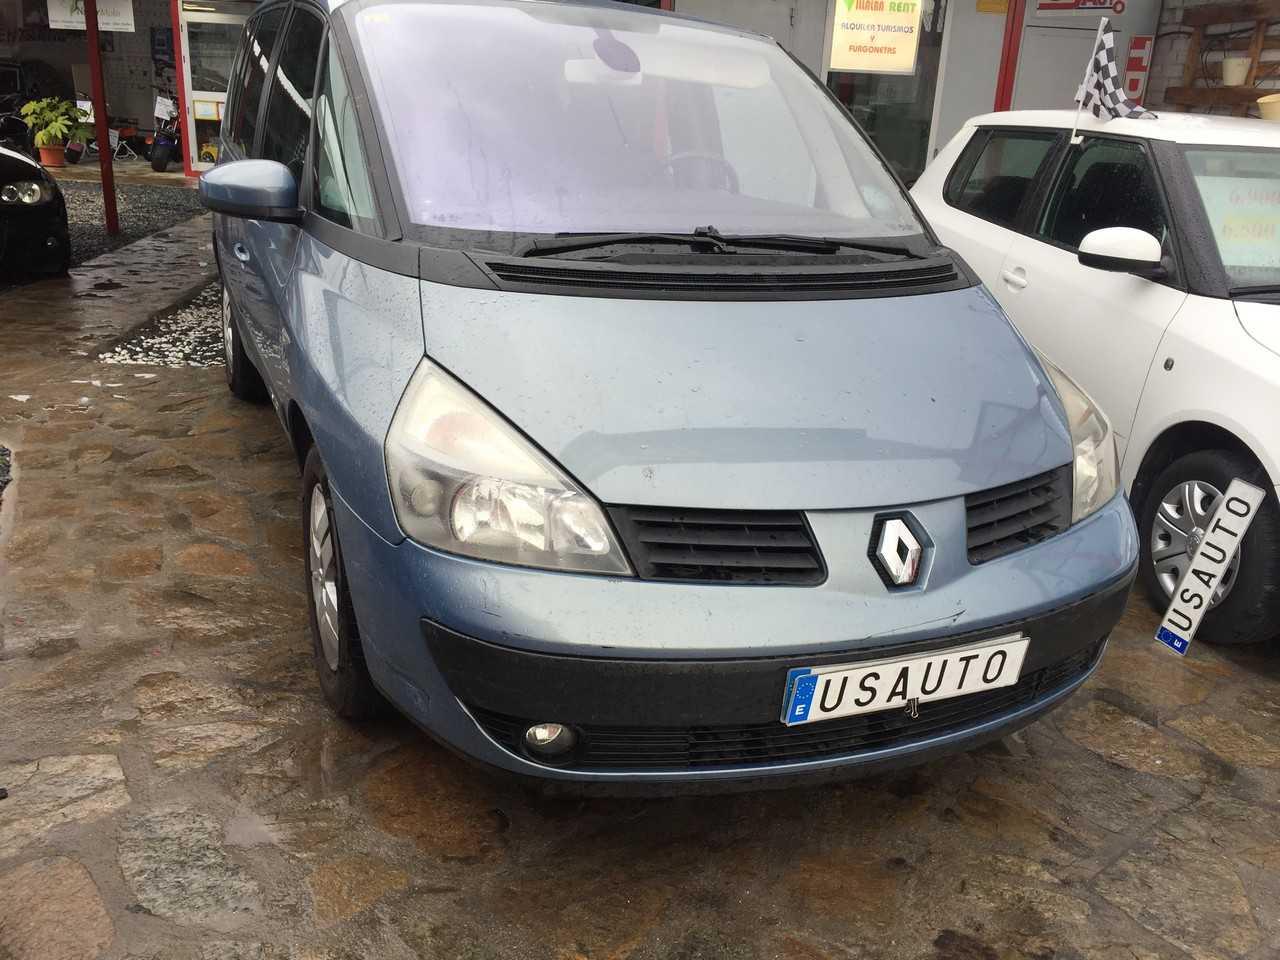 Renault Espace 1.9 DCI EXPRESSION   - Foto 1